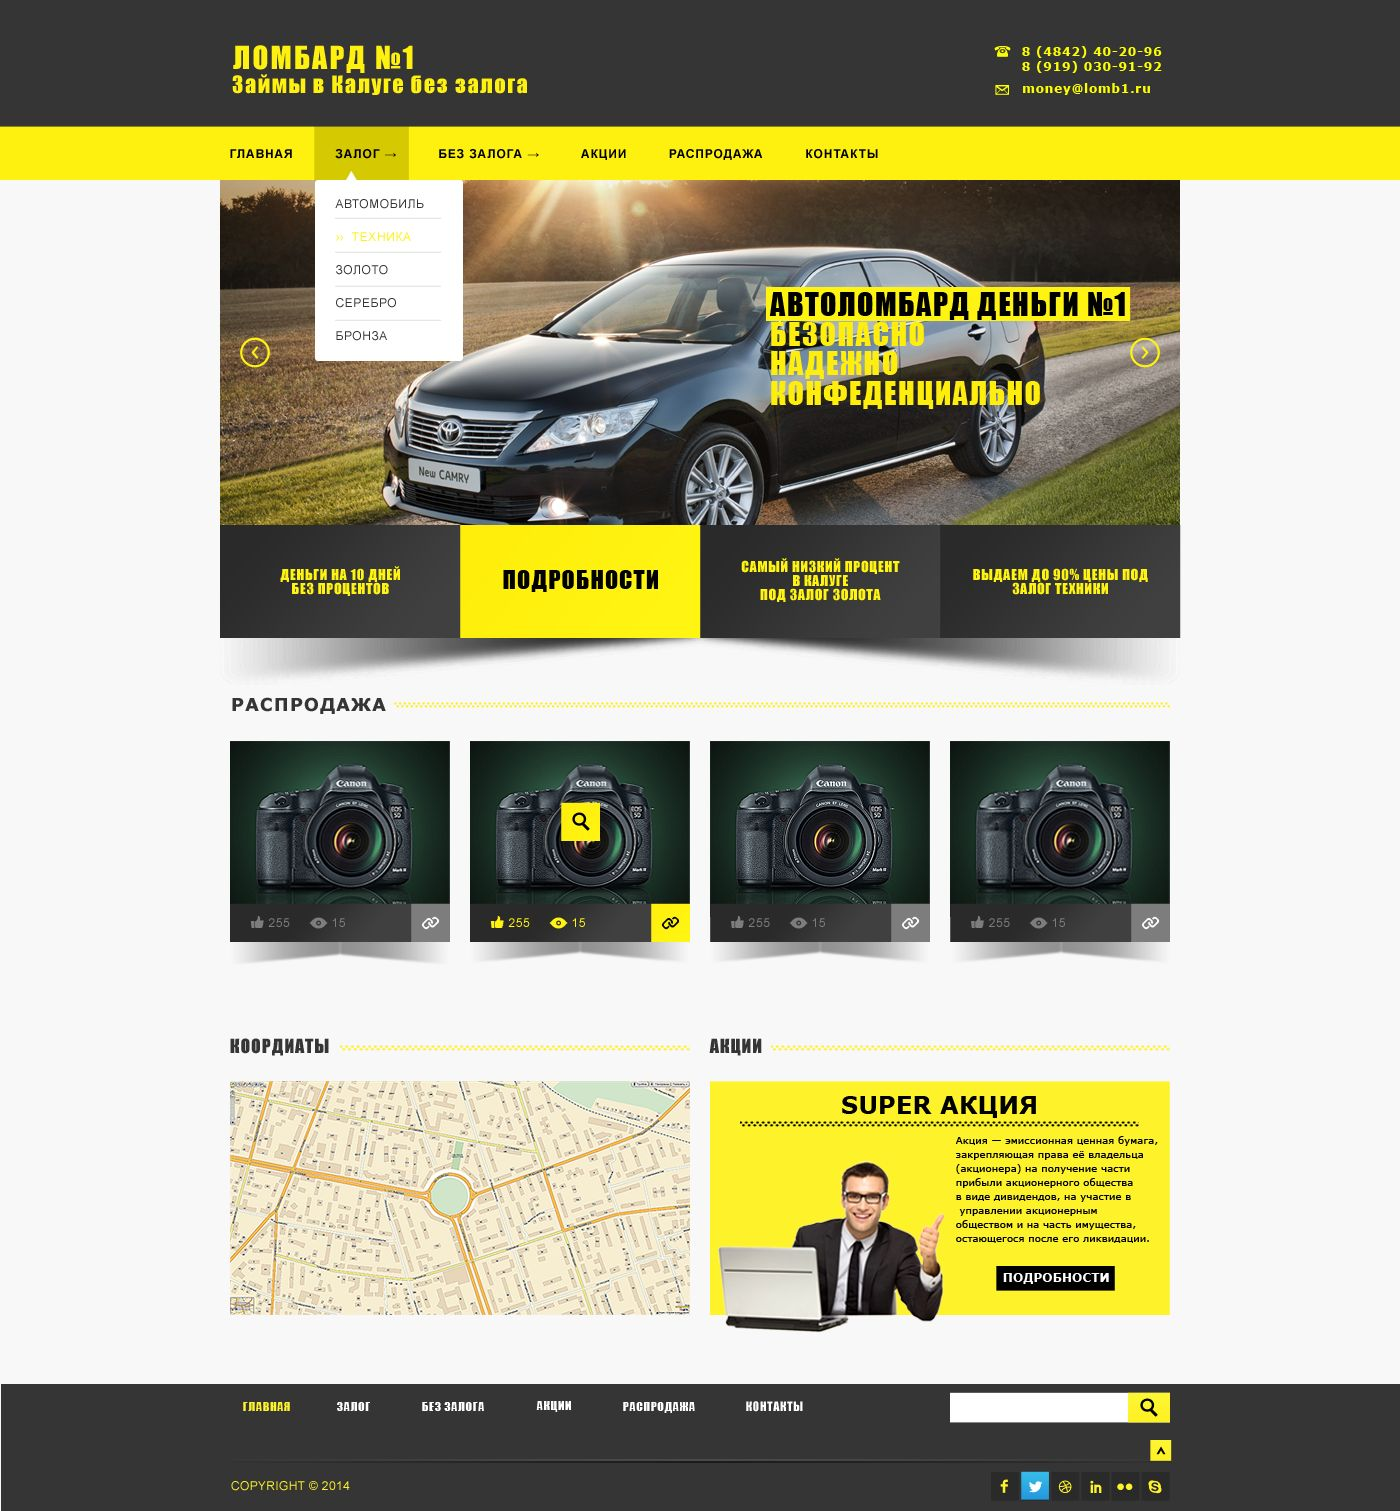 Дизайн главной страницы сайта Ломбард №1 - дизайнер versalio108